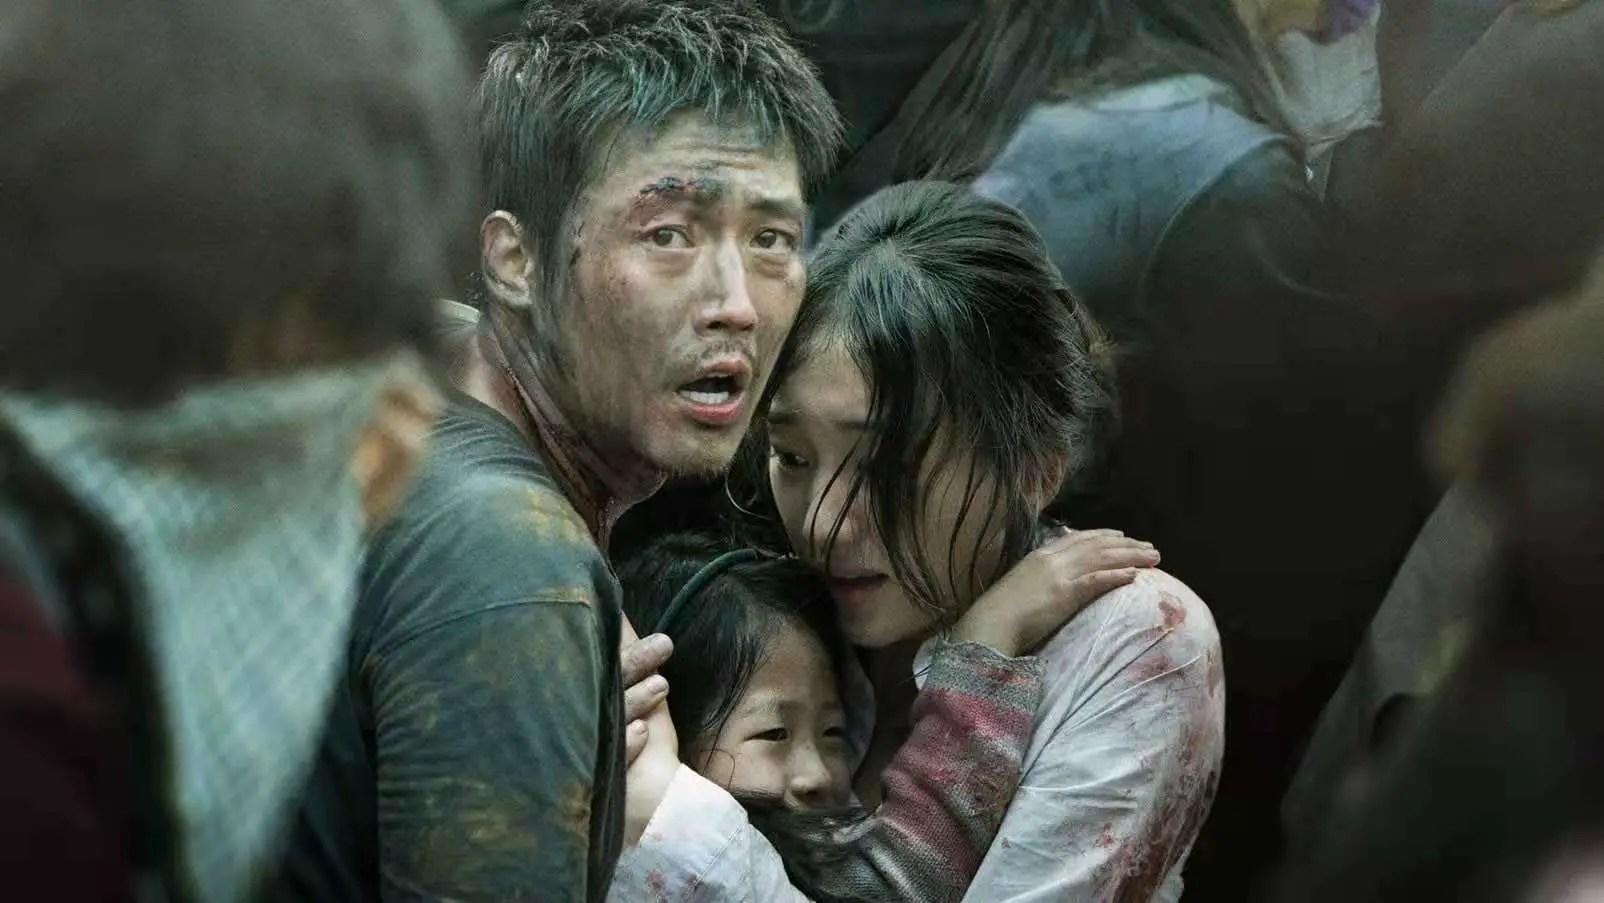 Flu | Filme sul-coreano sobre epidemia está entre os destaques da ...